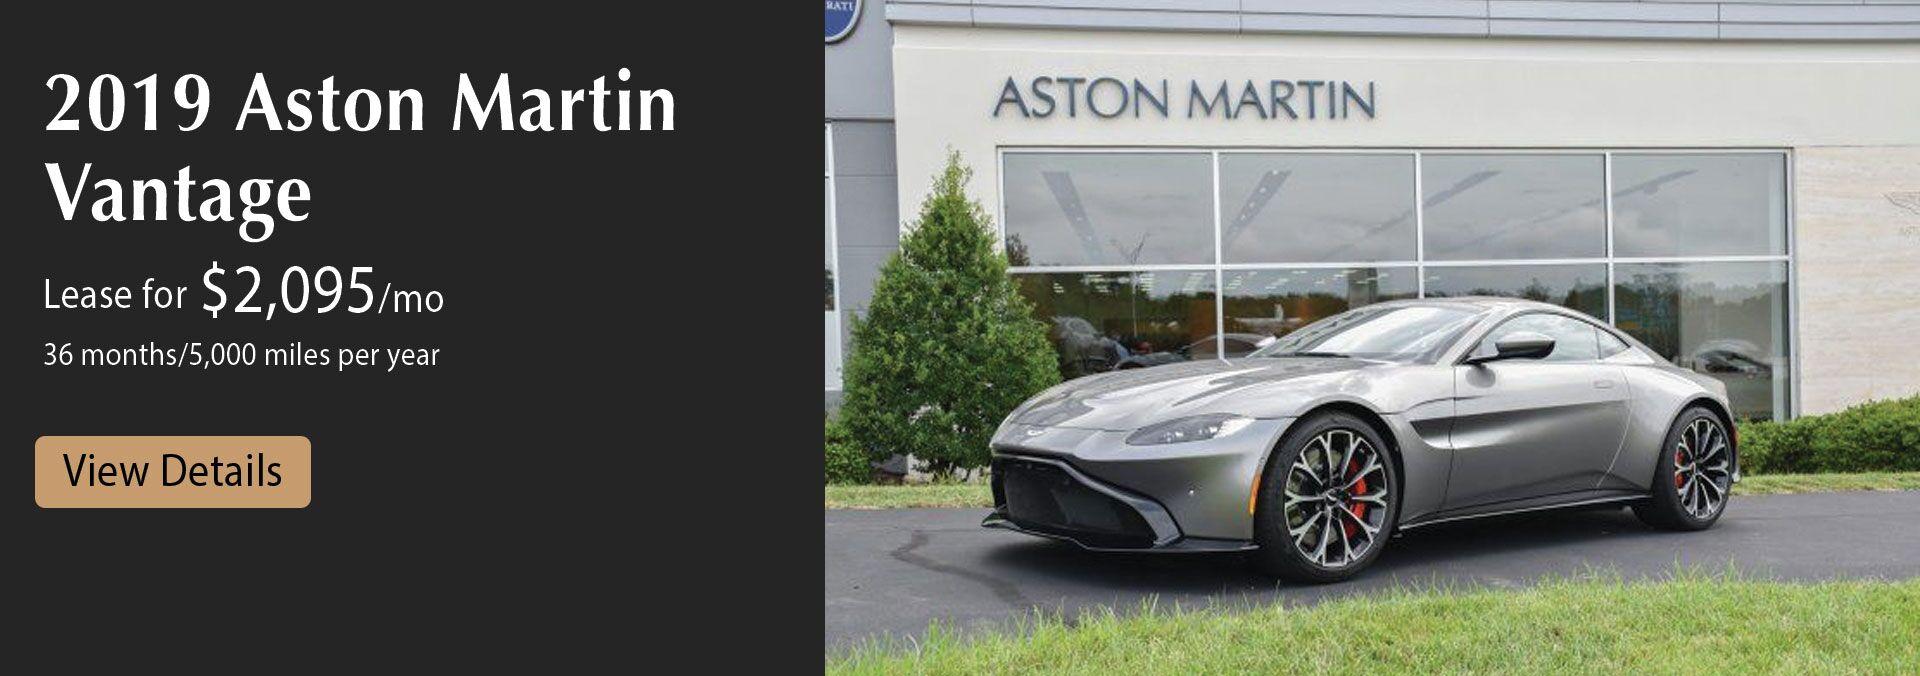 Aston martin ferrari maserati porsche dealership greensboro nc welcome to foreign cars italia in greensboro nc solutioingenieria Images